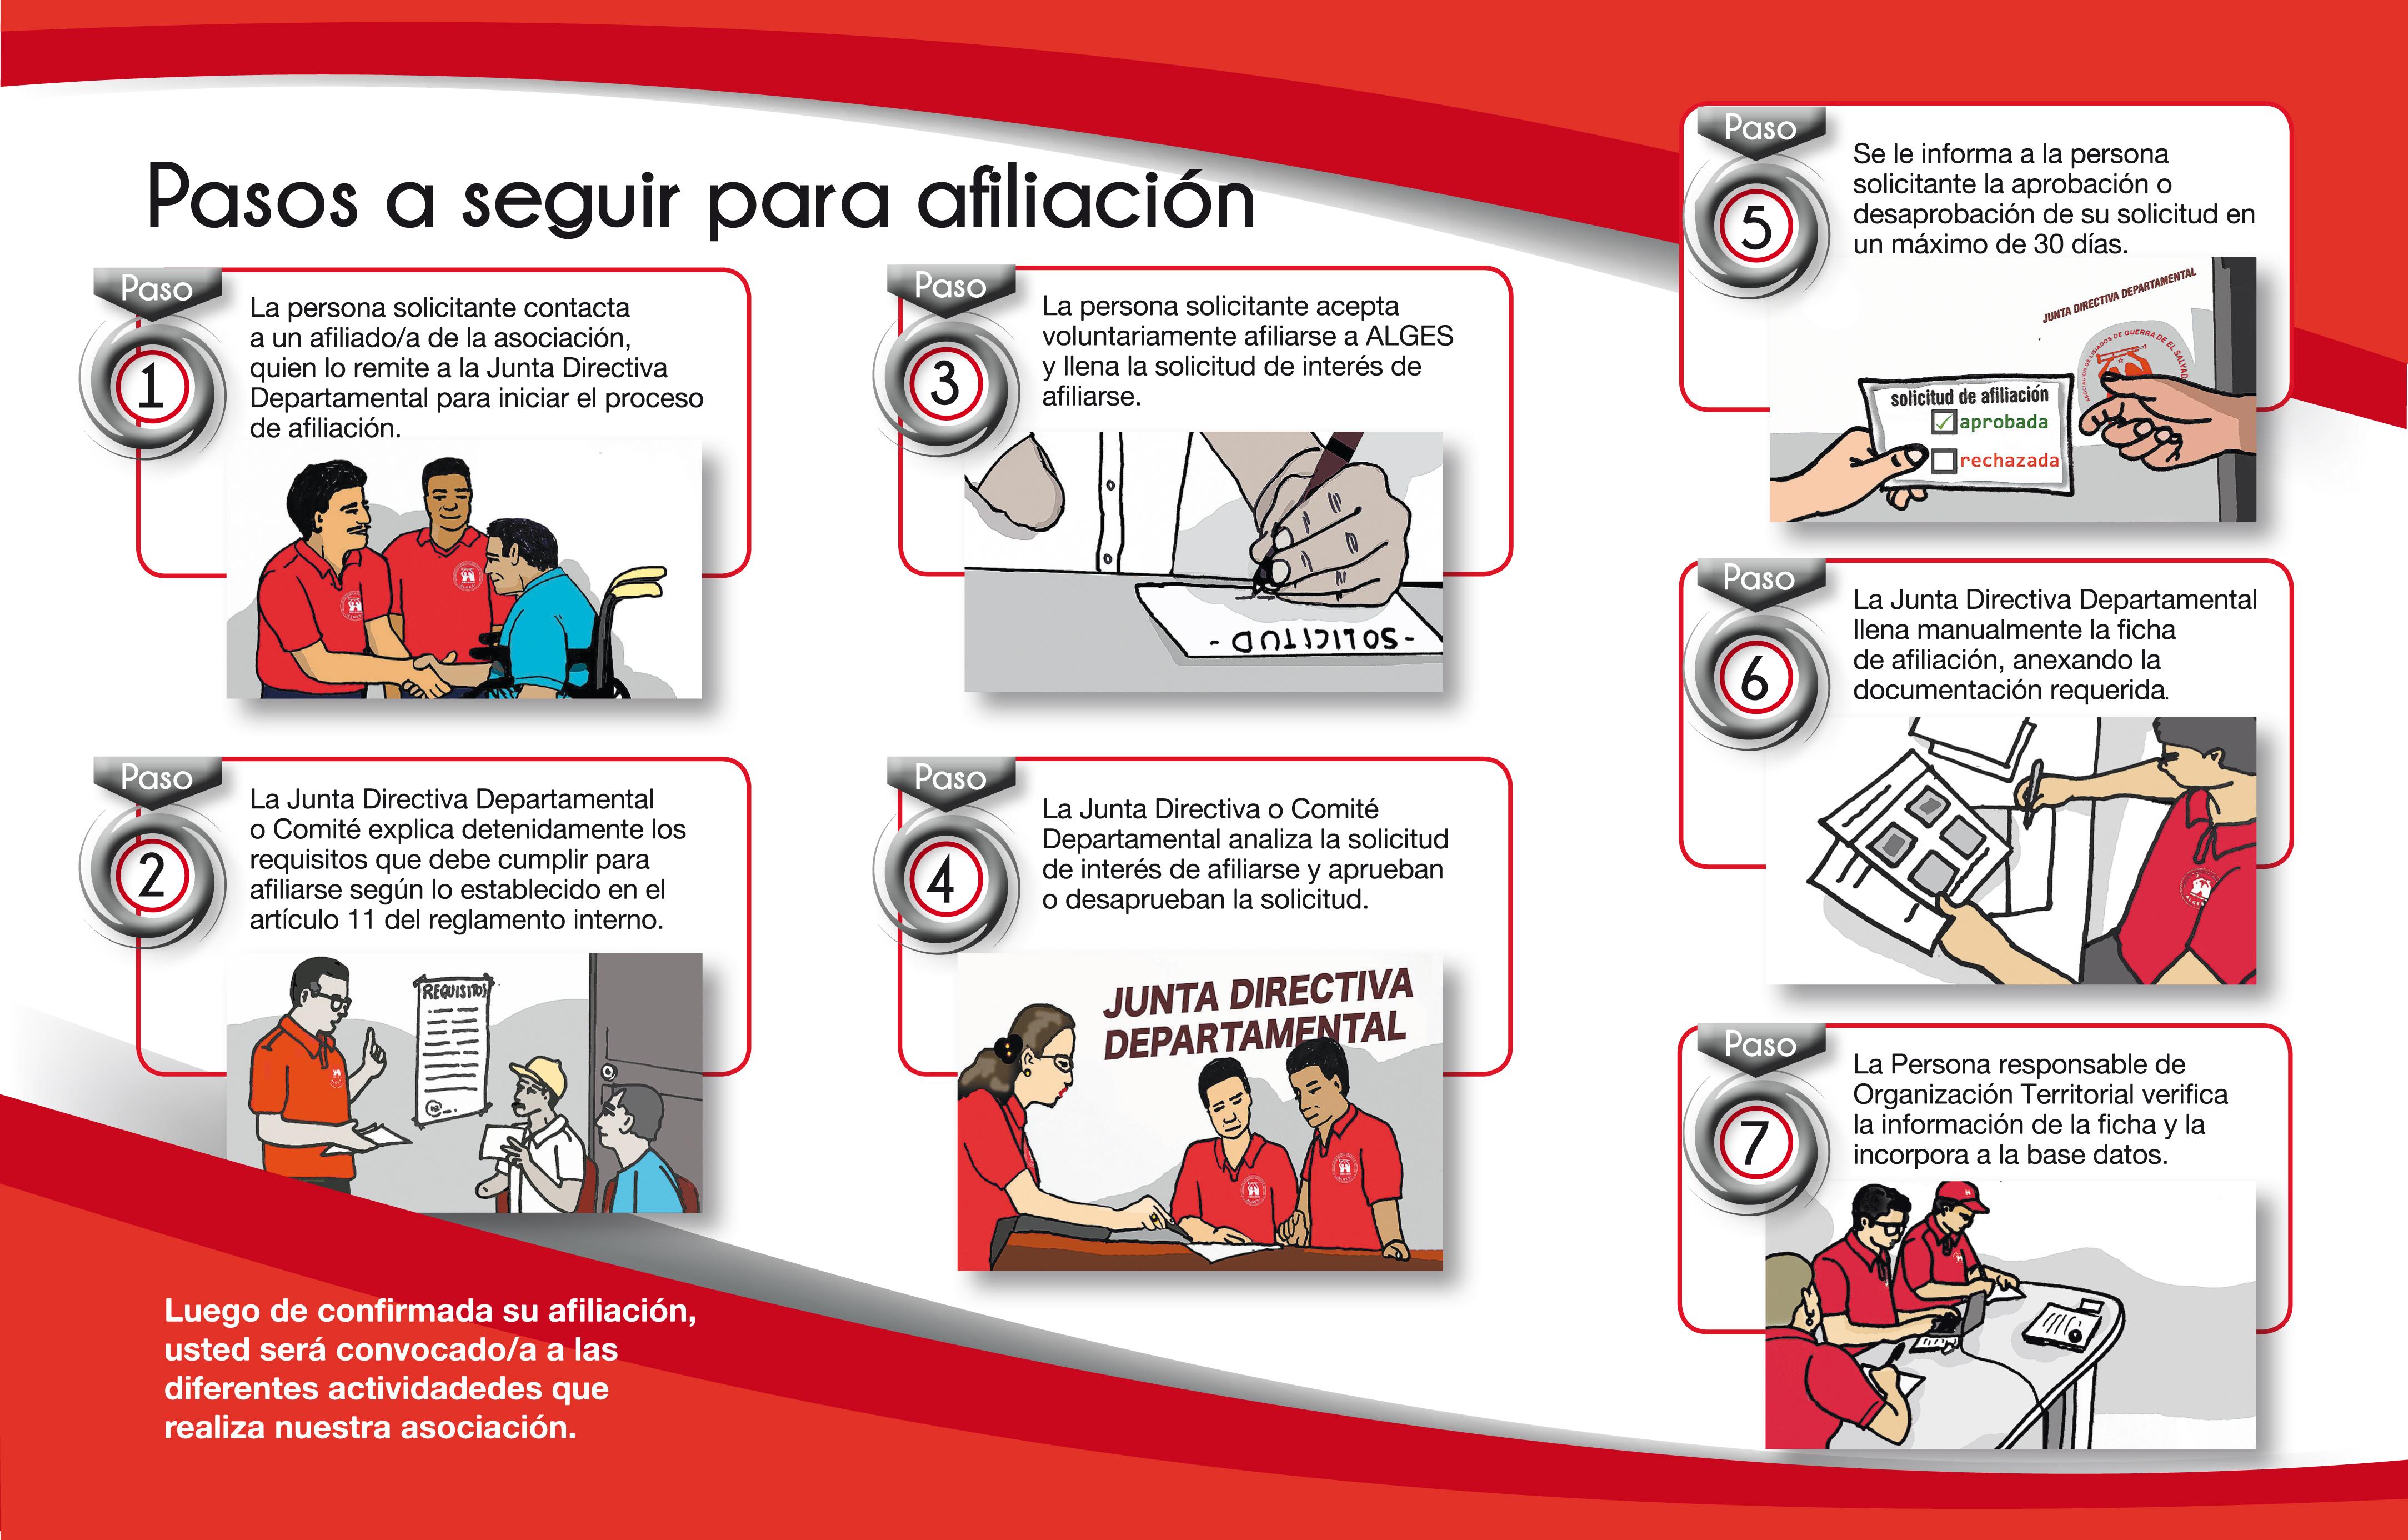 Pasos_para_afiliarse_a_ALGES-2.jpg